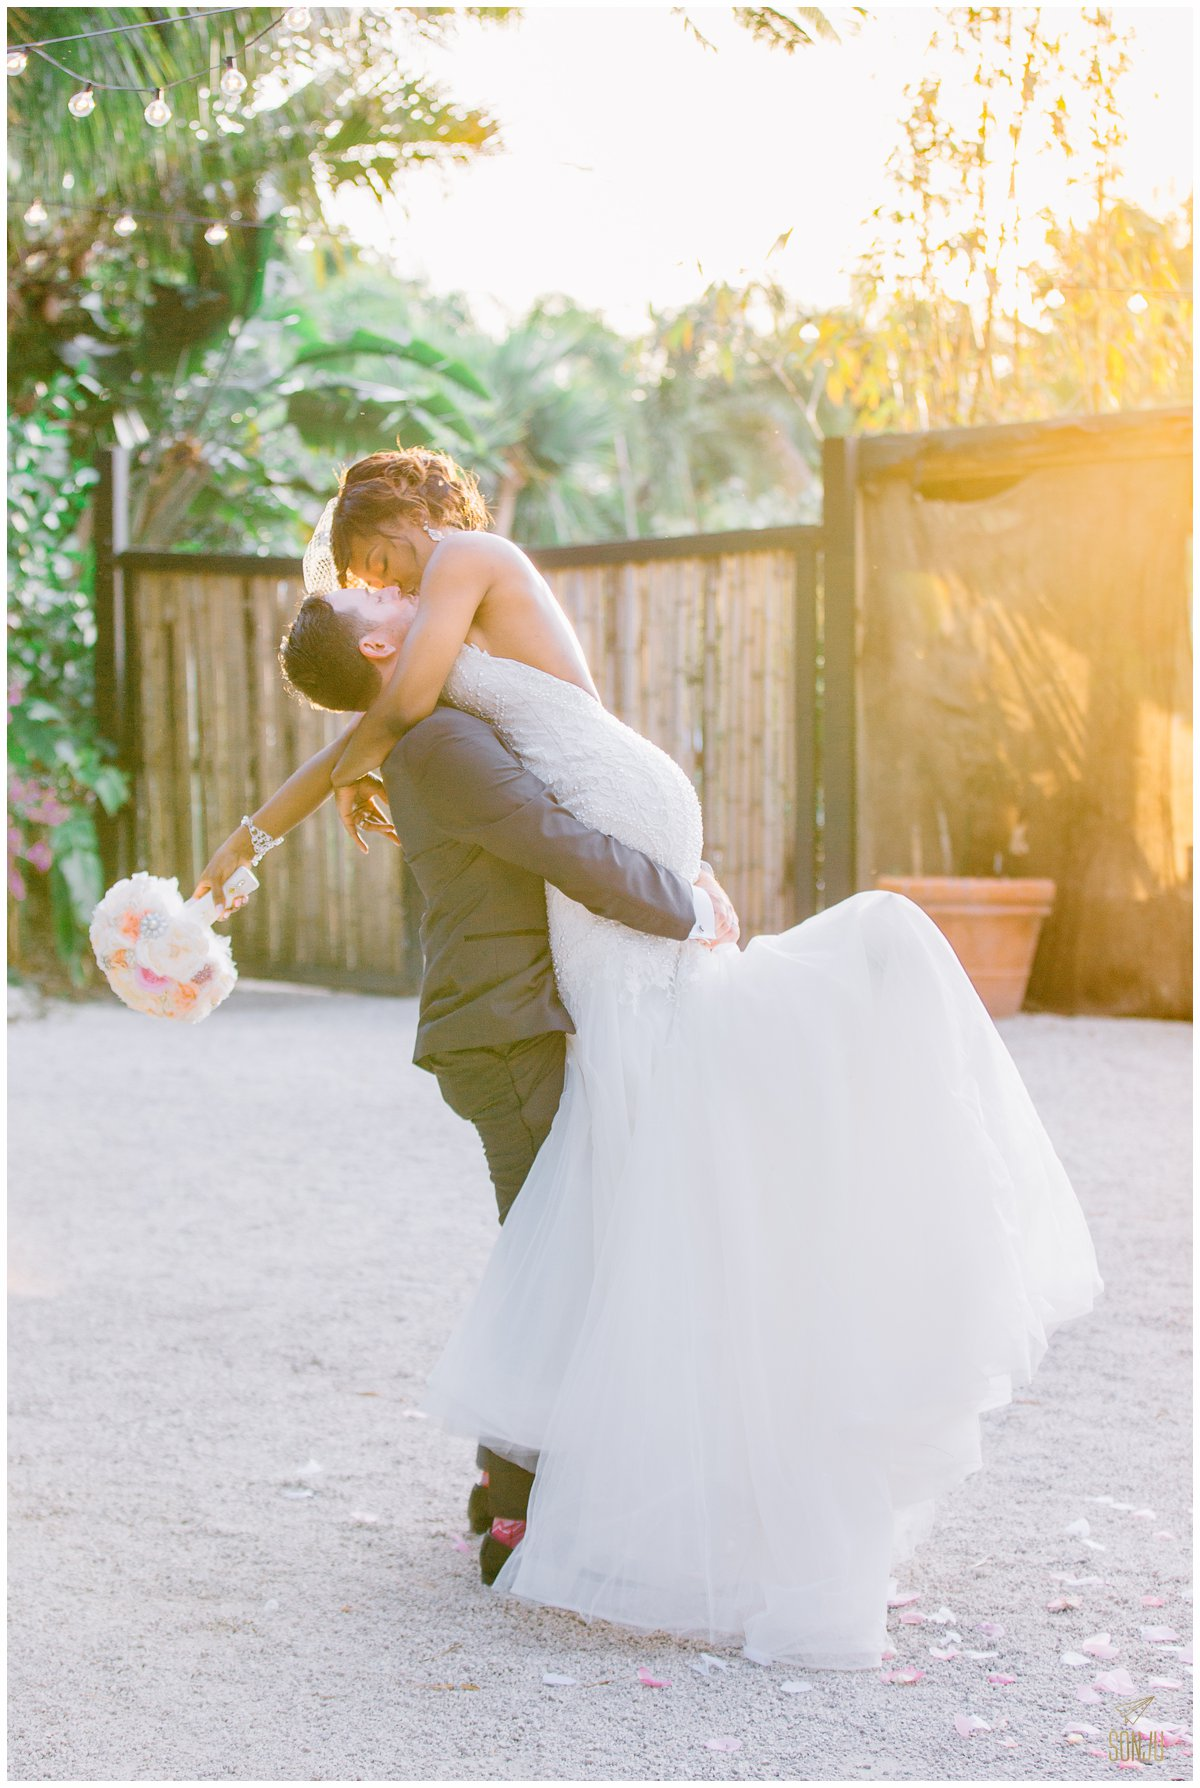 Bamboo-gallery-ft-lauderdale-wedding-tamique-bryan00037.jpg